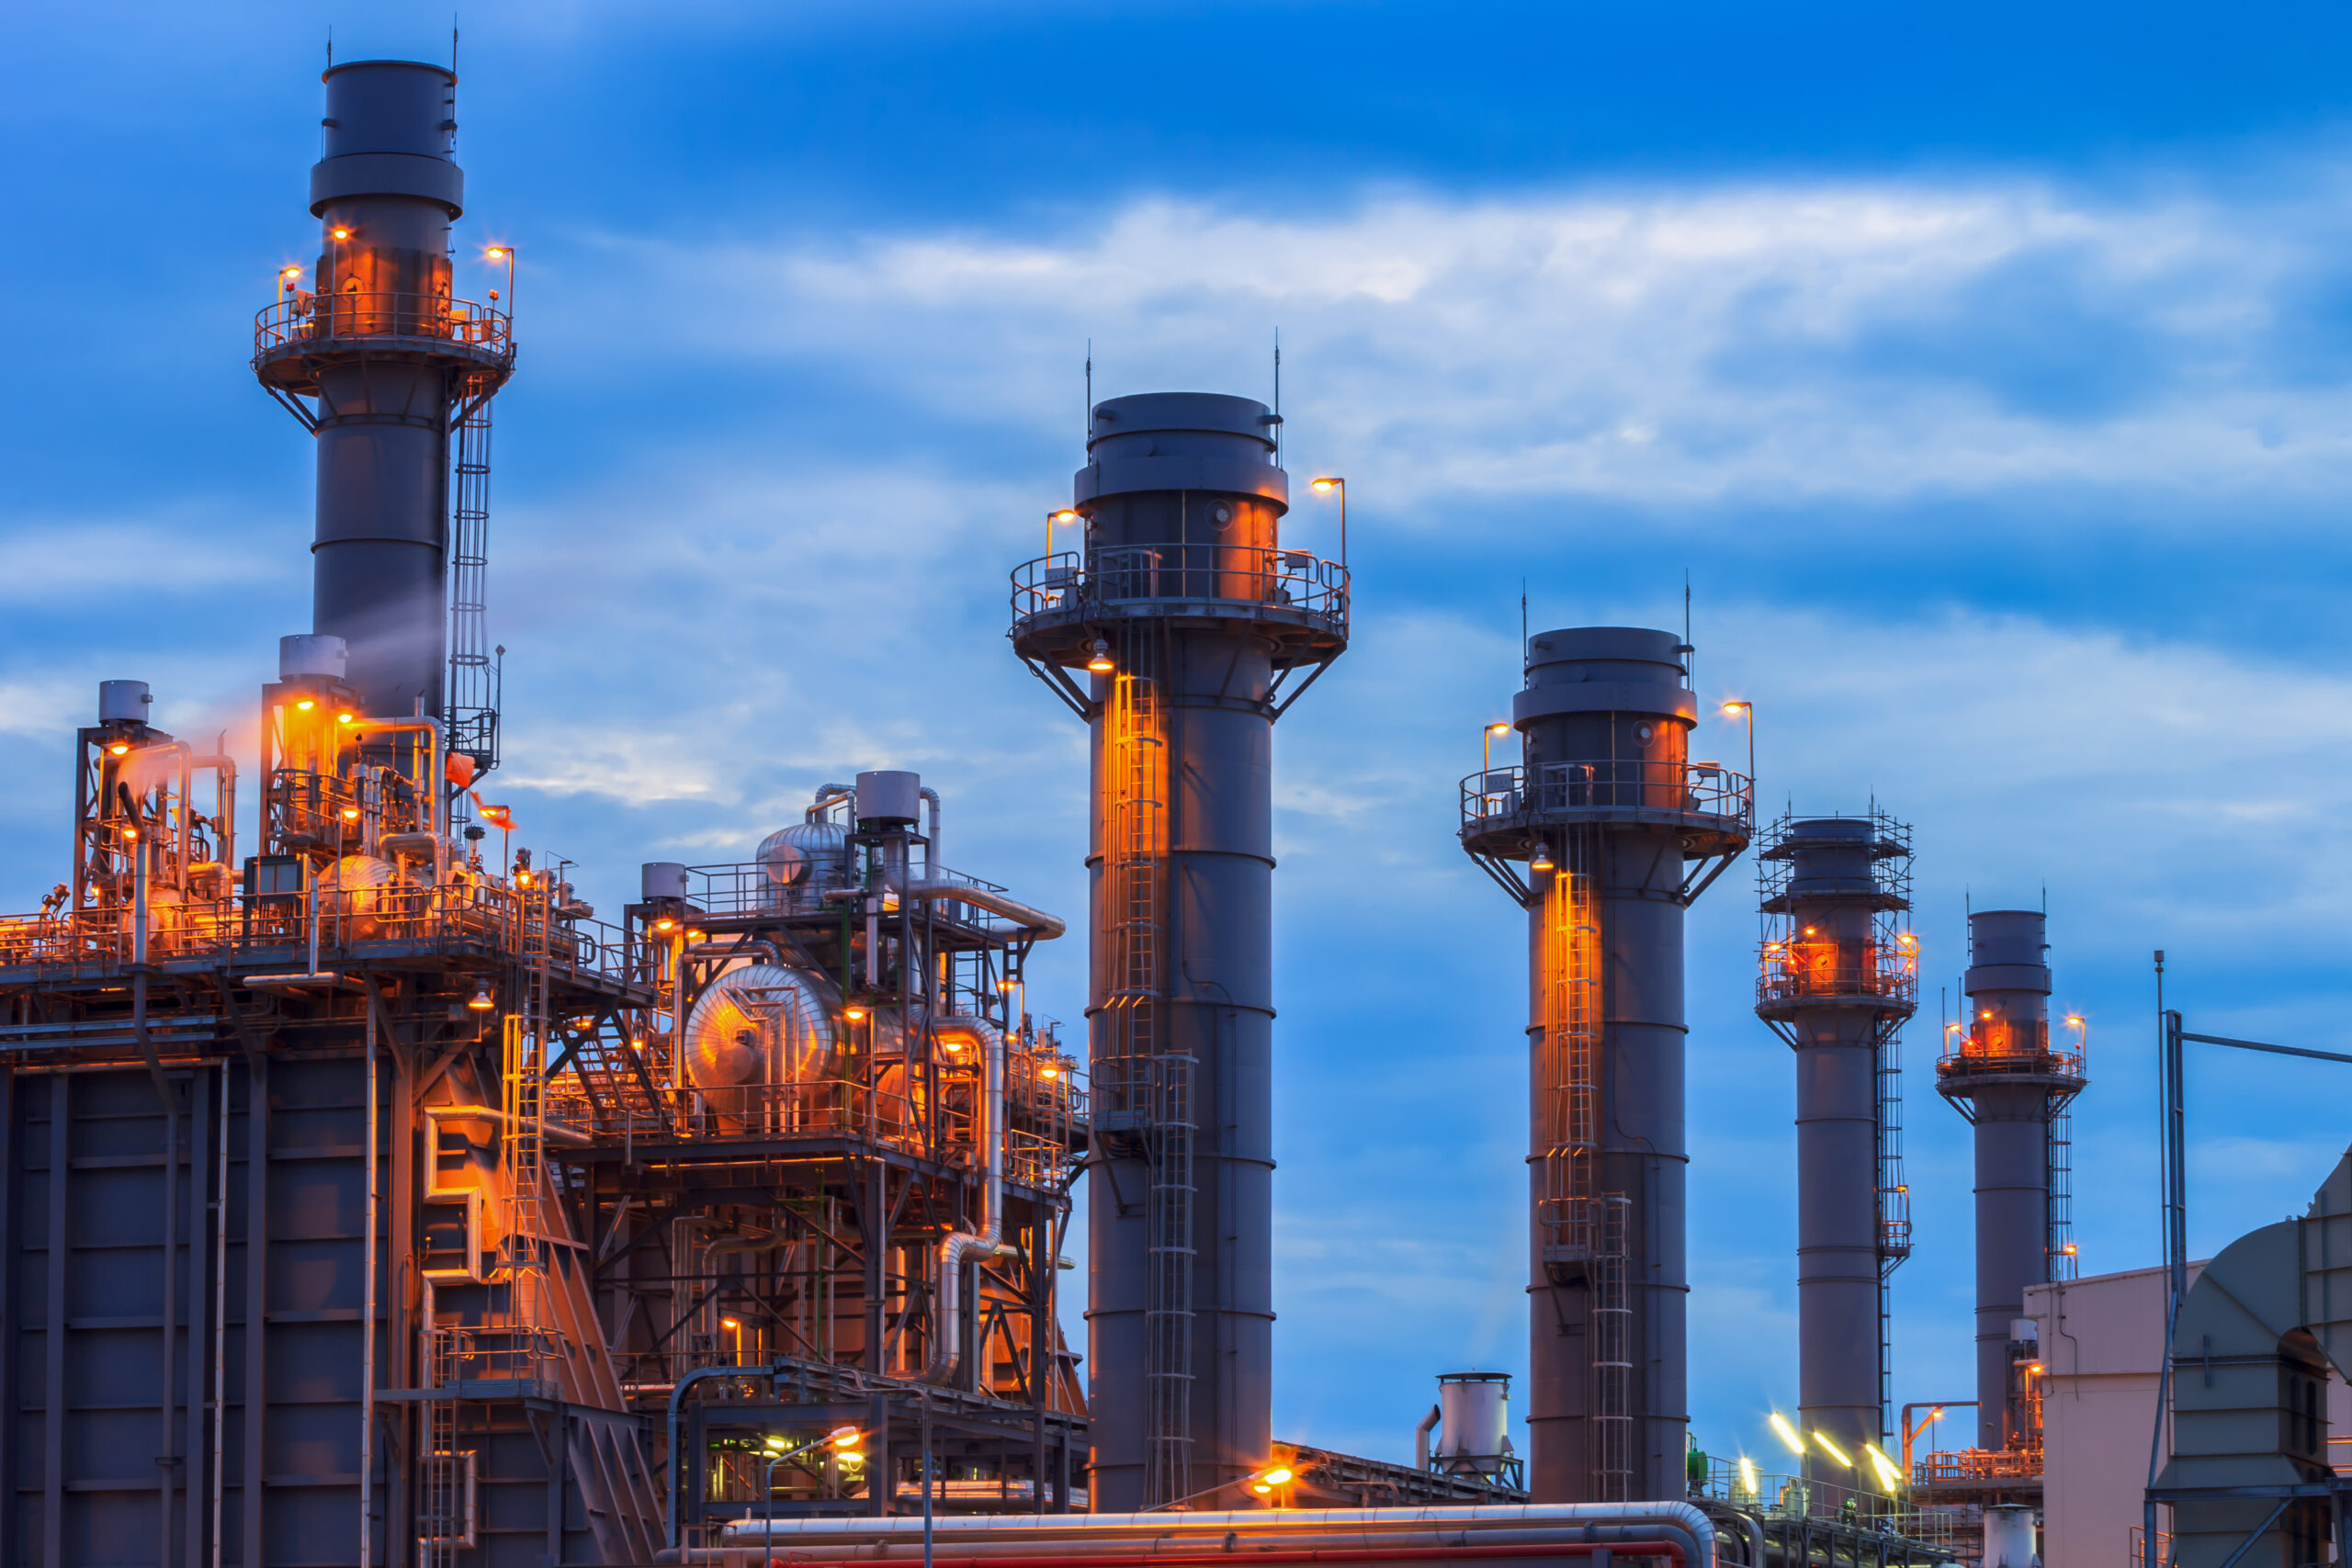 Deltic natural gas